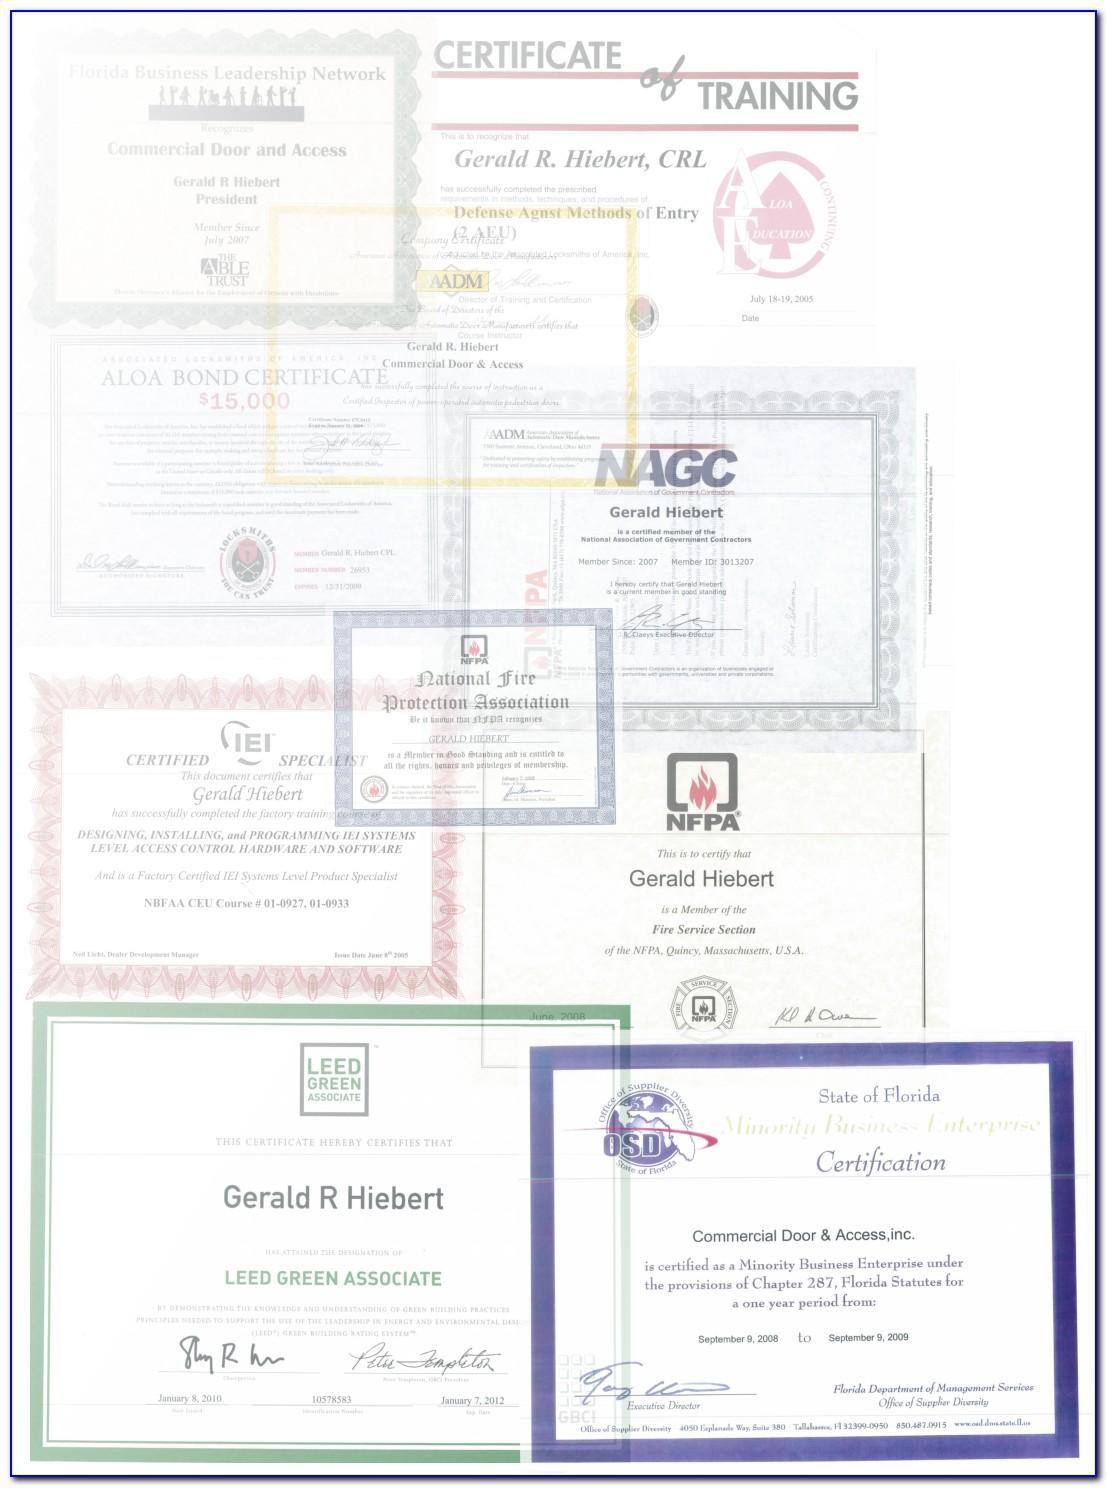 Cda Certification Florida Requirements